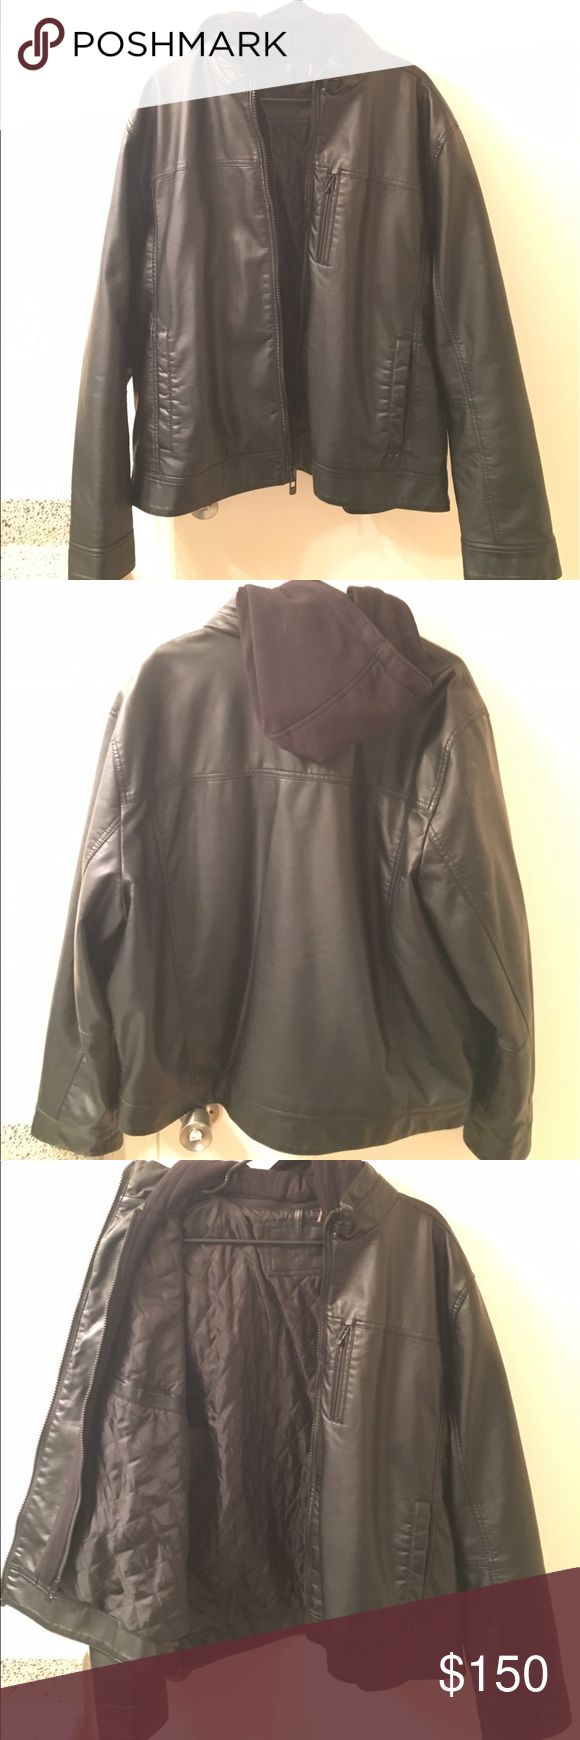 Calvin Klein. Black Leather Jacket with hood. Brand new. Never worn. Calvin Klein Jackets & Coats Bomber & Varsity